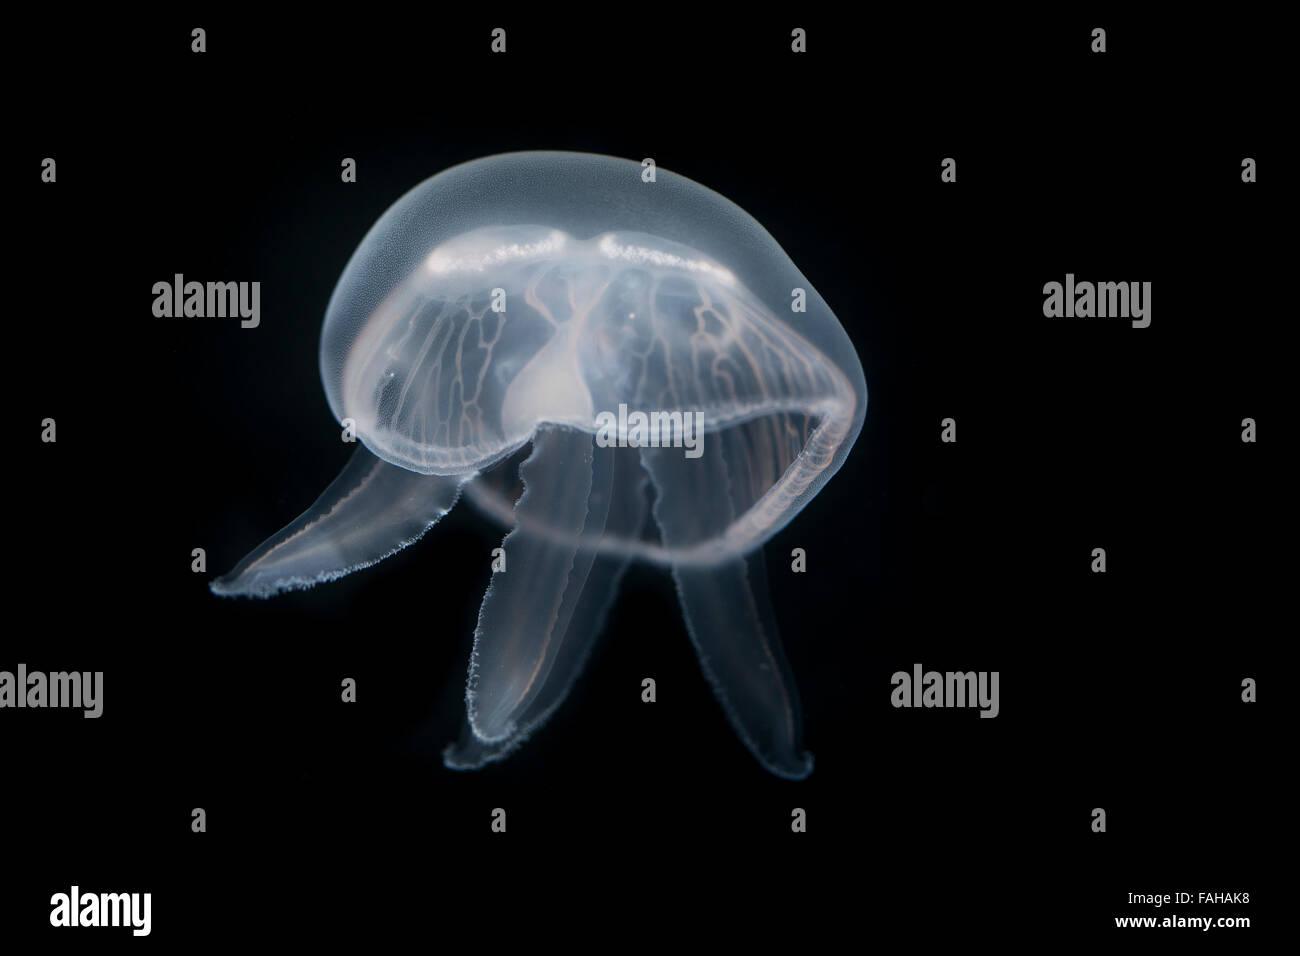 Moon jelly, moon jellyfish, common jellyfish, saucer jelly, Ohrenqualle, Ohren-Qualle, Qualle, Quallen, Aurelia - Stock Image